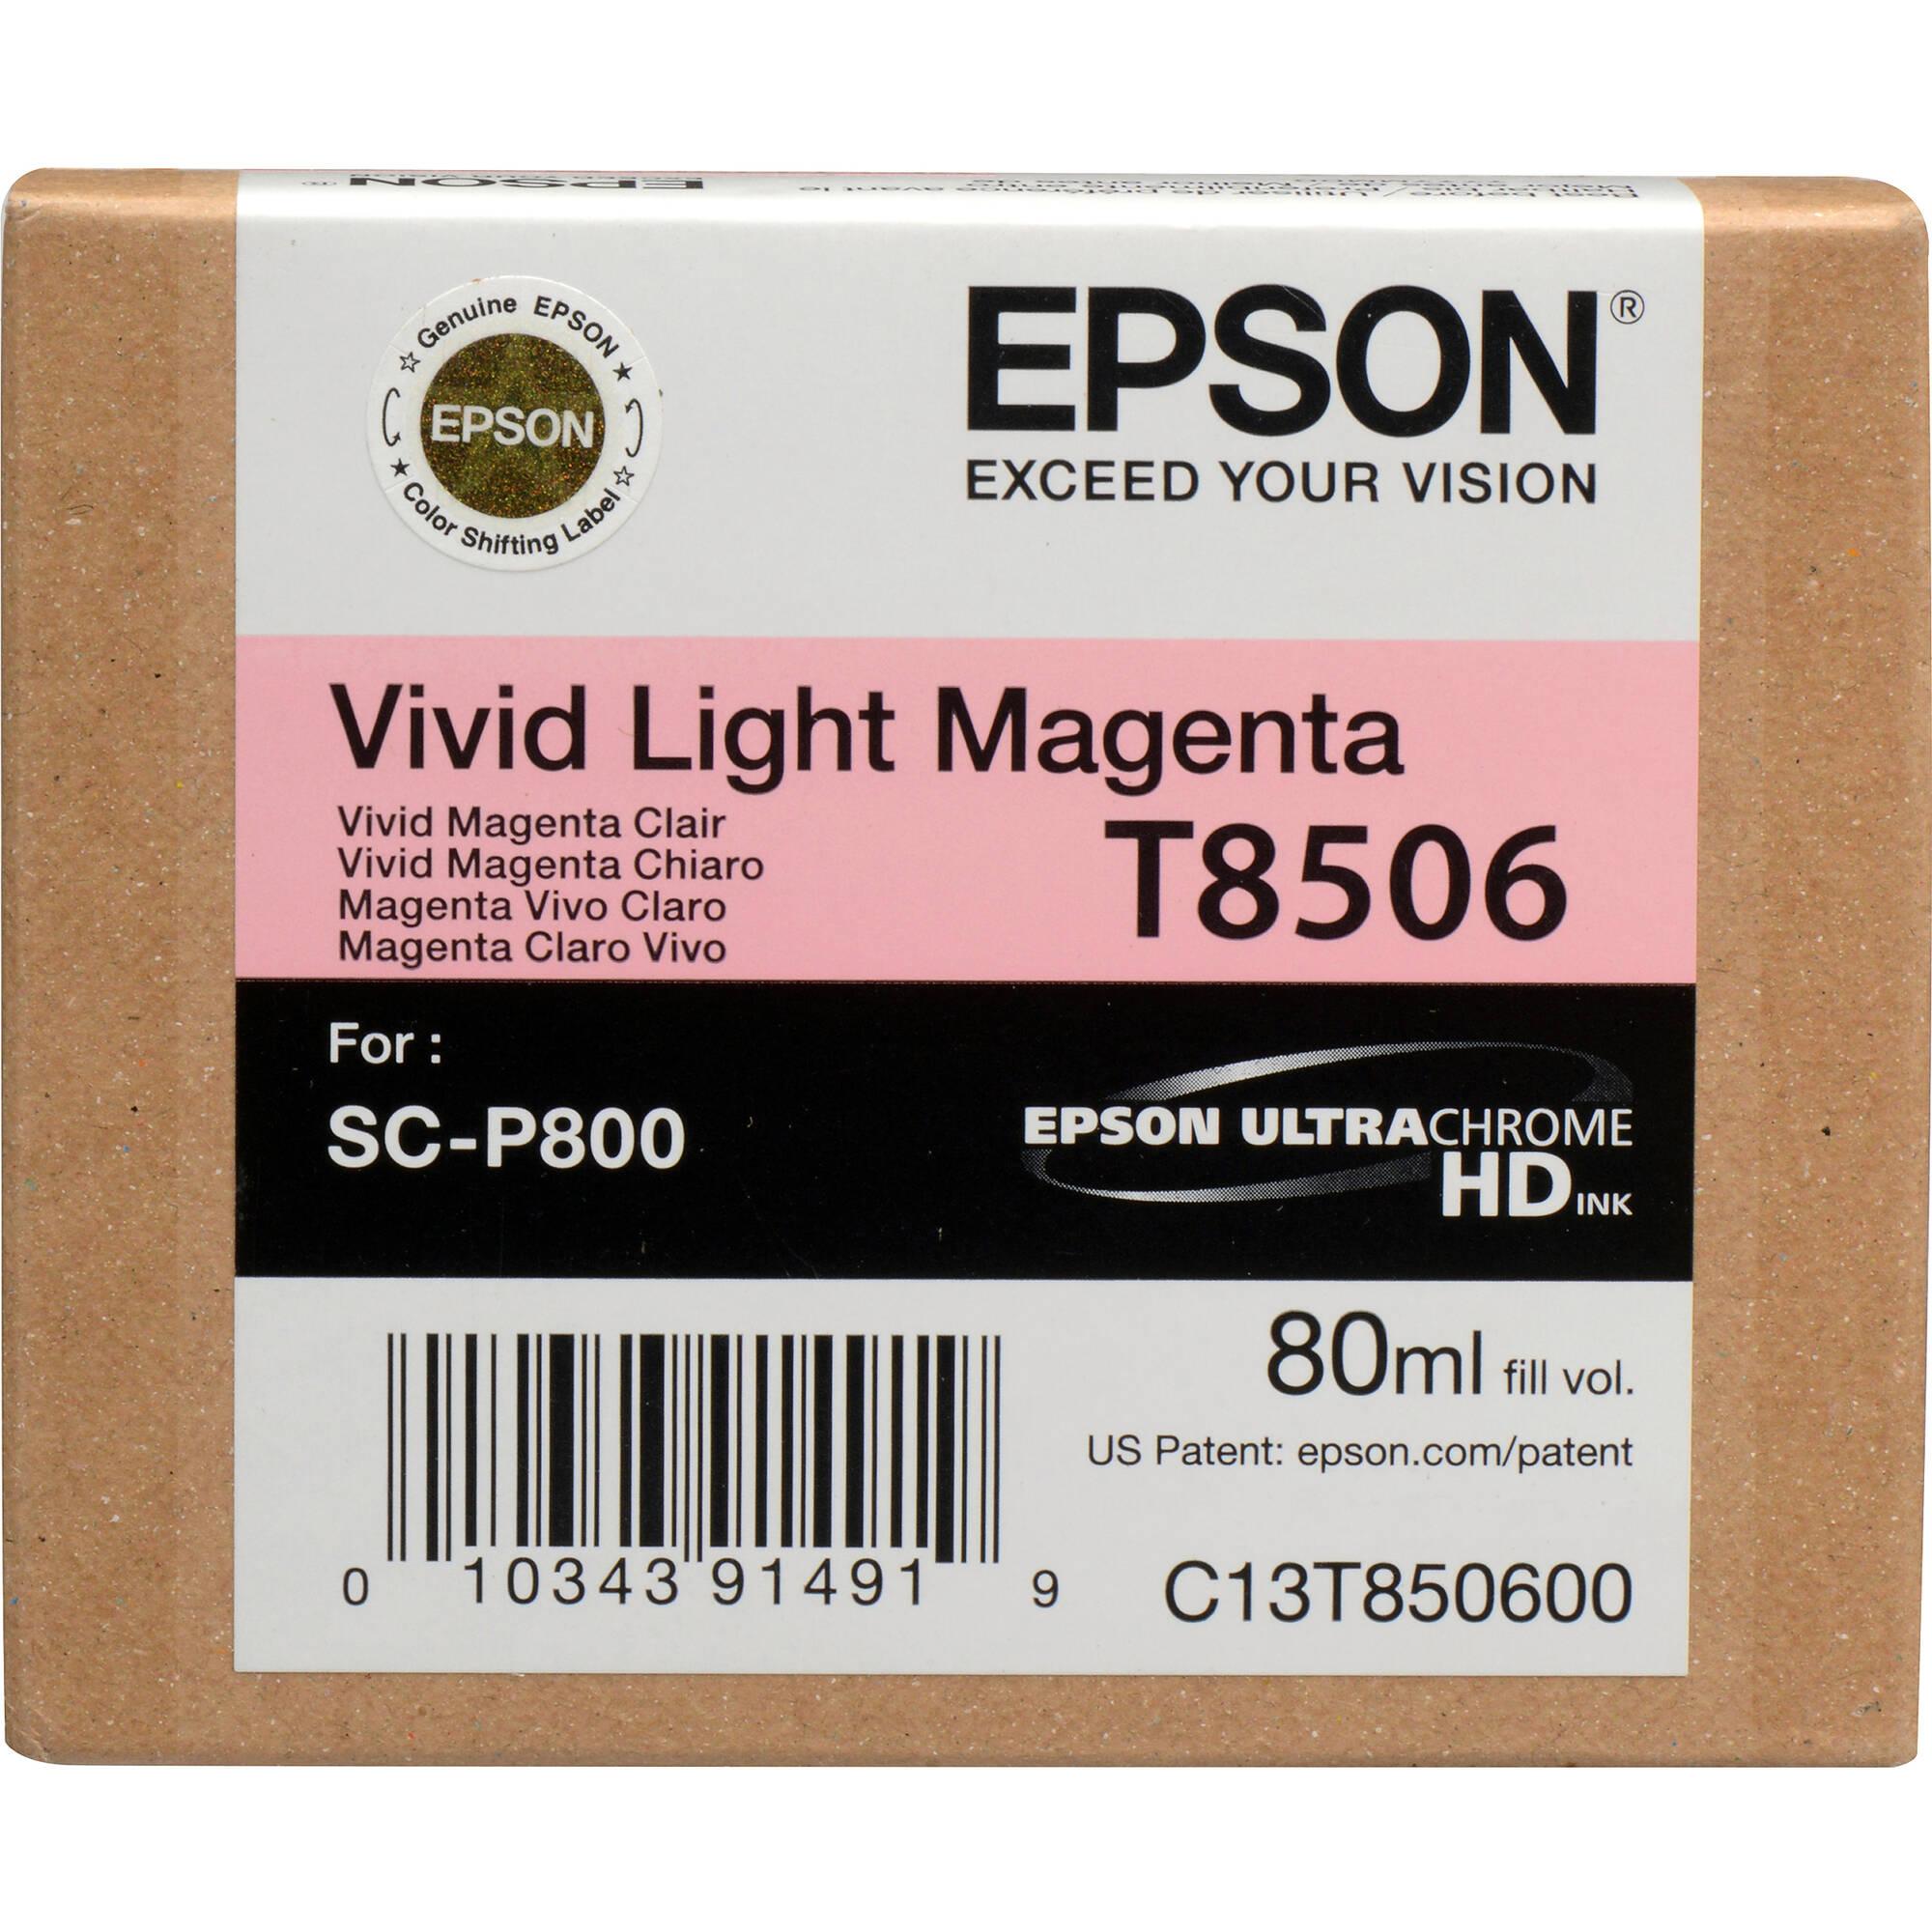 Light Magenta Epson T7606 Vivid Ink Cartridge